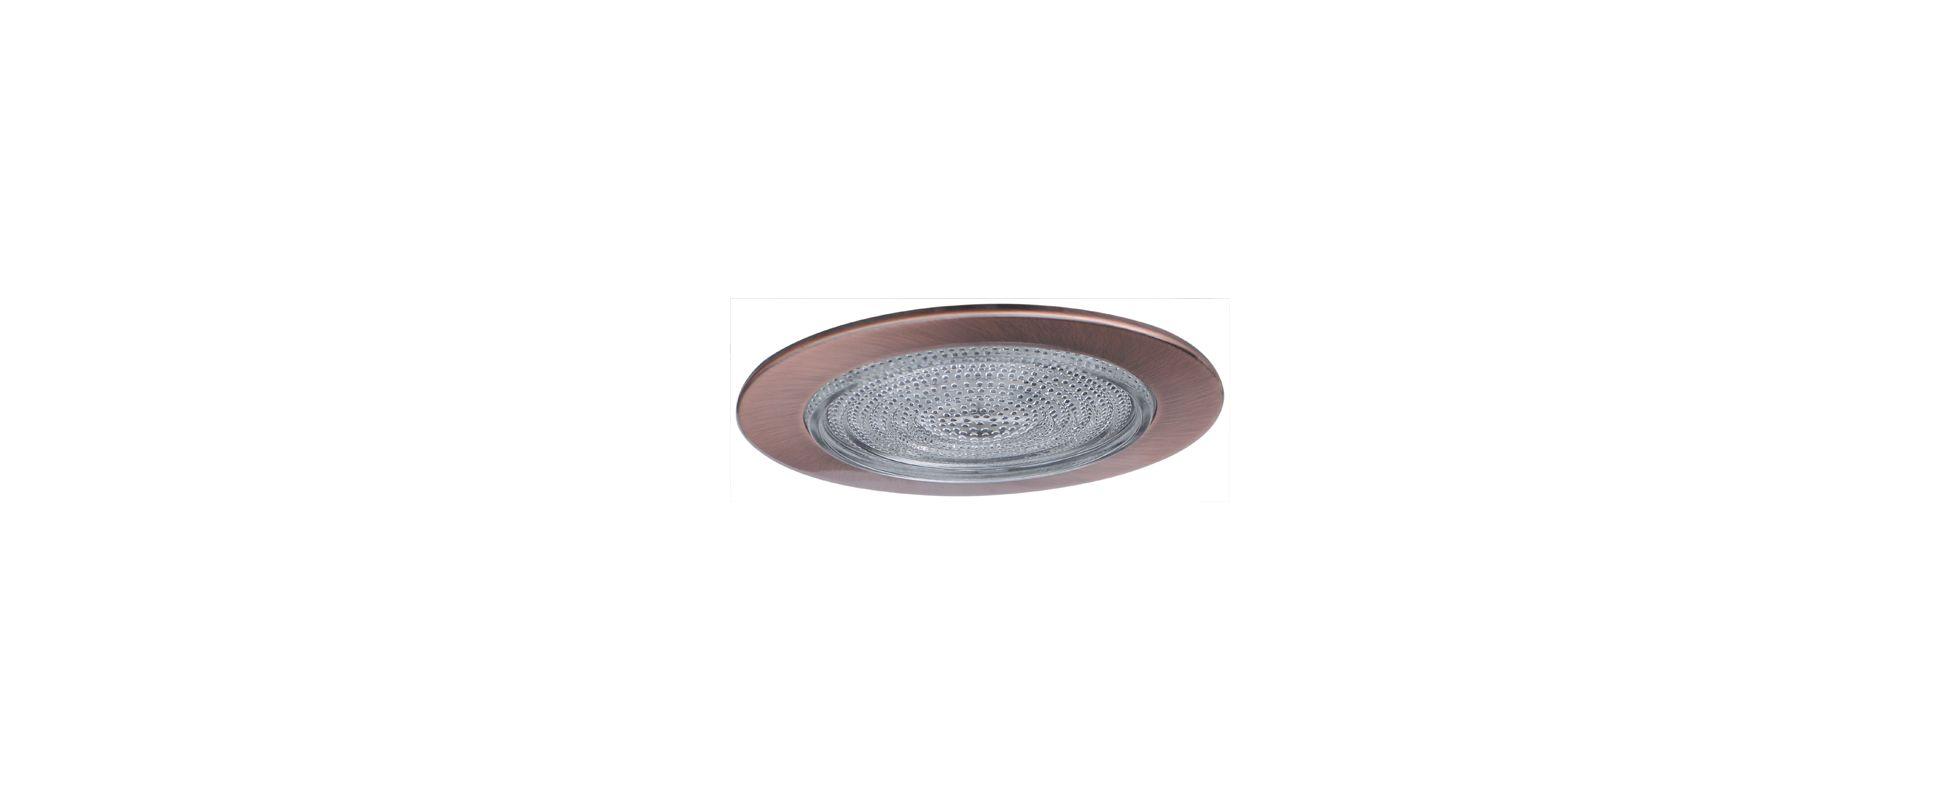 "Elco EL513 5"" Shower Trim with Fresnel Lens Copper Recessed Lights"